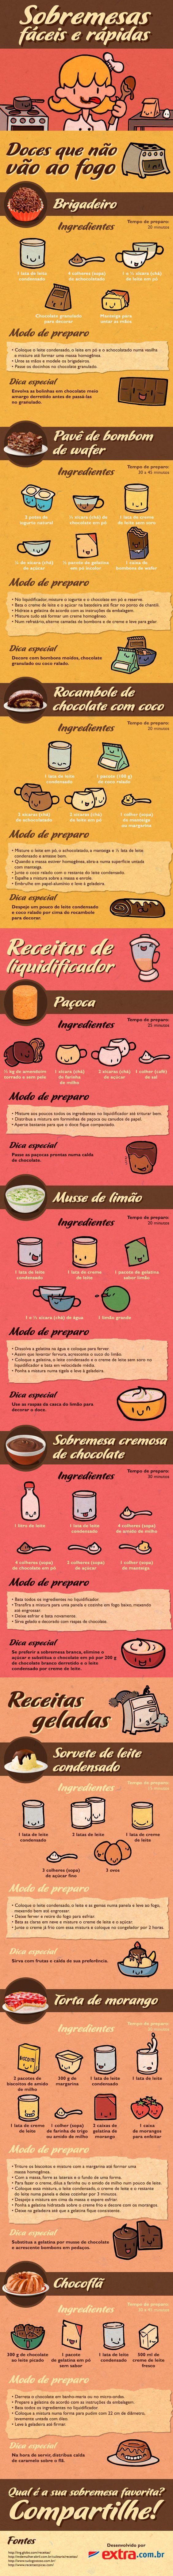 Infográfico - Receitas de Sobremesas Fáceis e Rápidas: